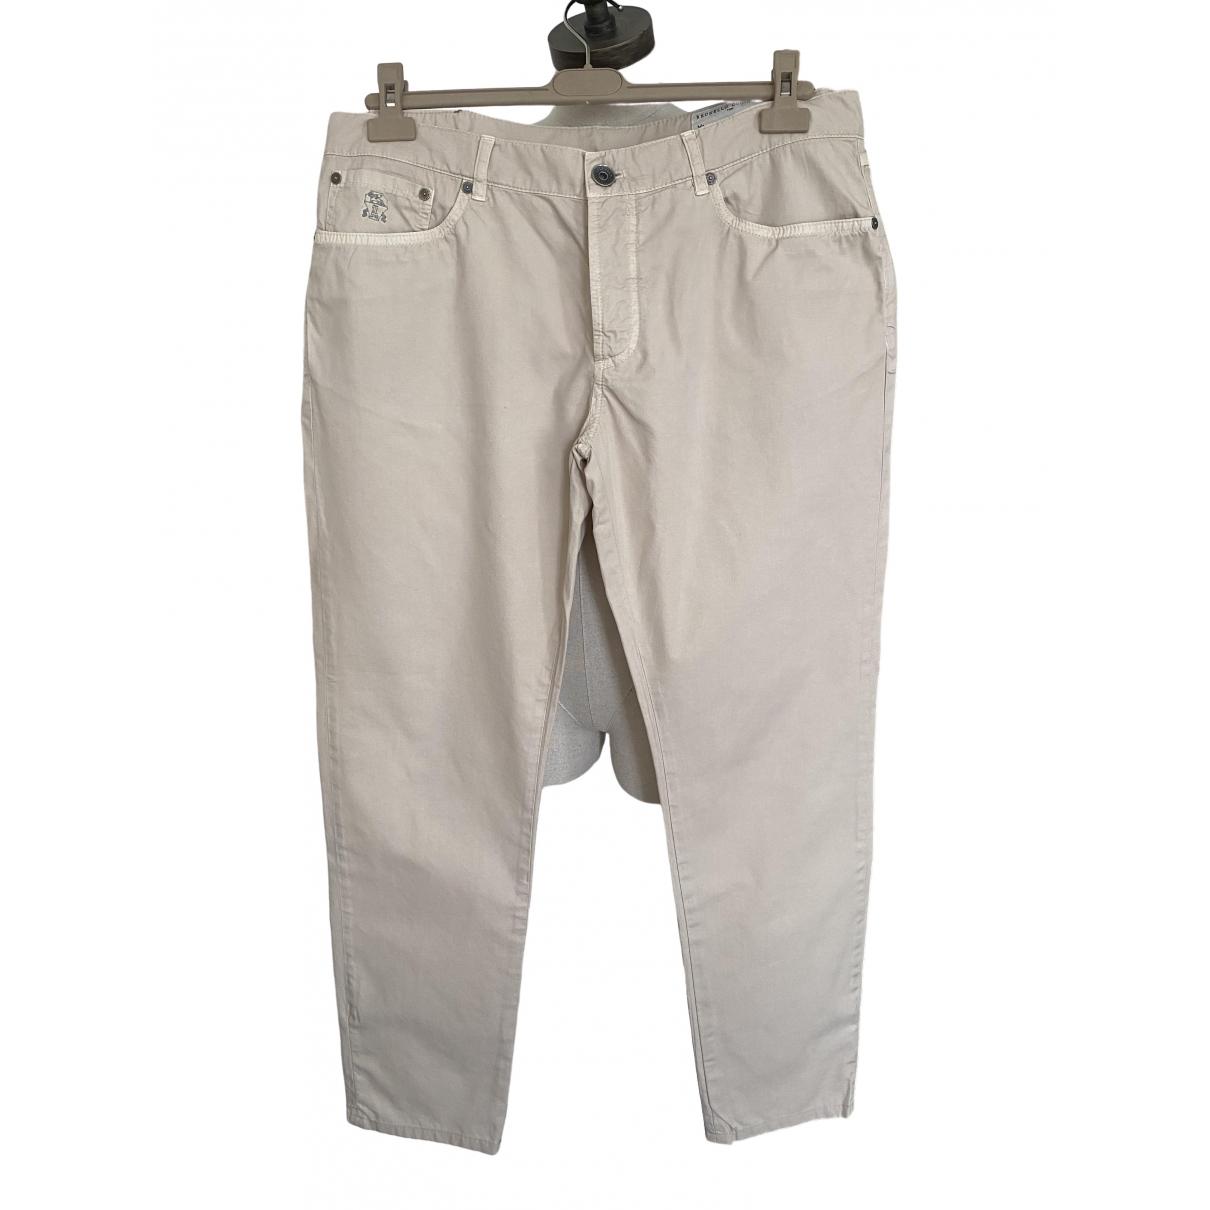 Pantalones en Algodon Beige Brunello Cucinelli